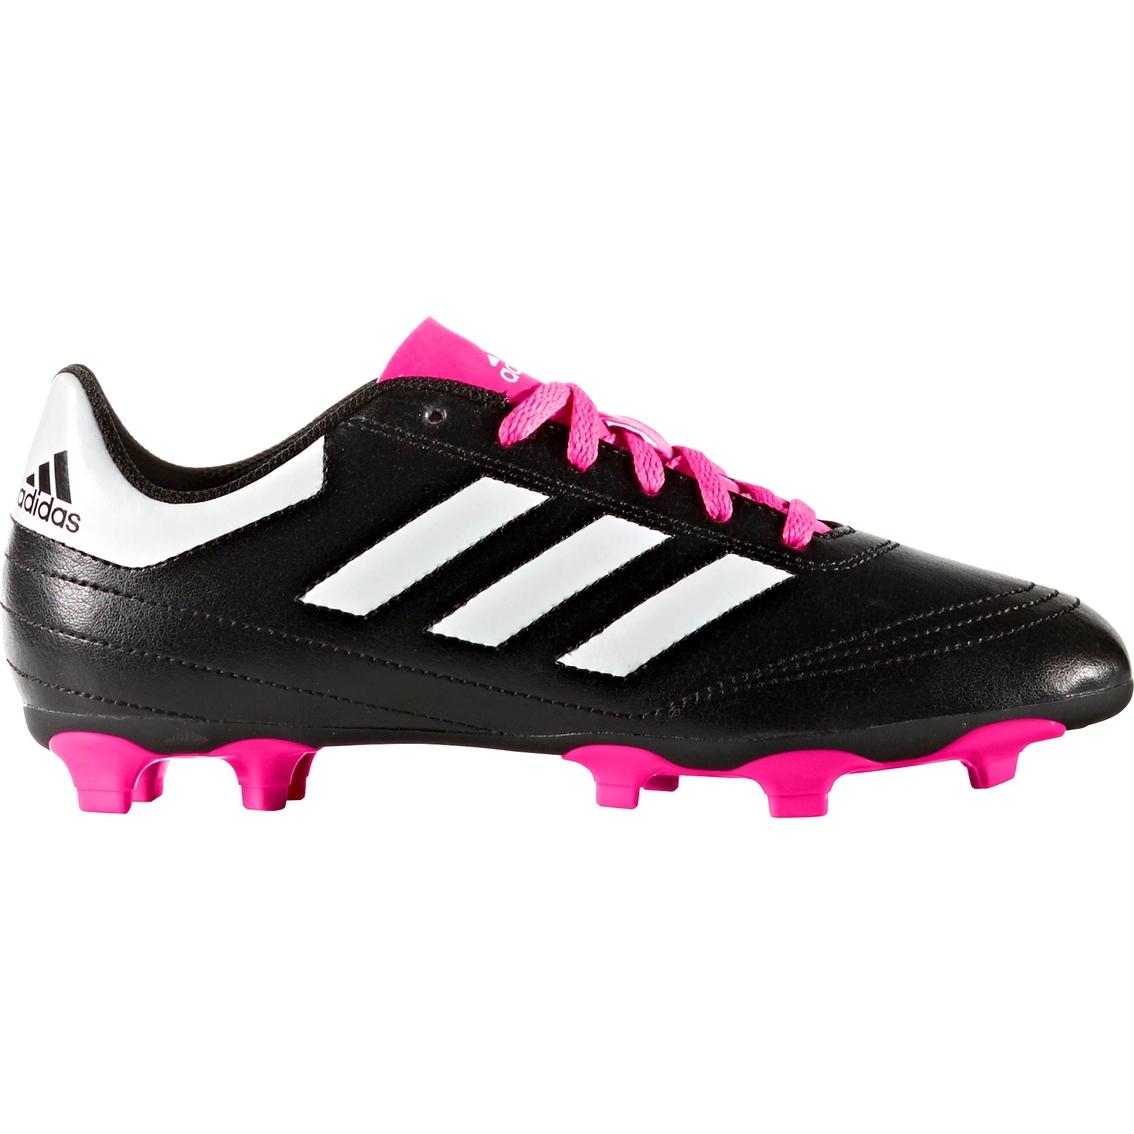 95e0a00172679 Adidas Girls Goletto Vi Fg J Soccer Cleats | Children's Athletic ...